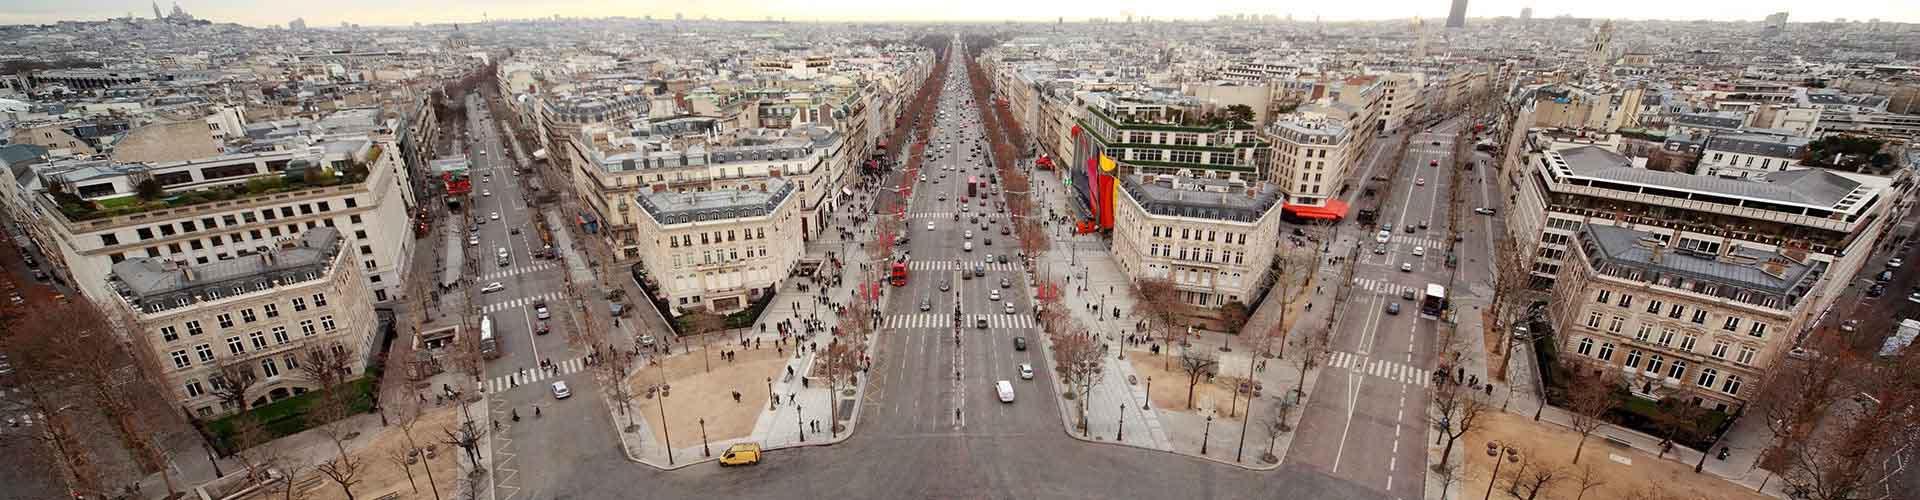 París - Albergues cerca a Boulevard Haussmann. Mapas de París, Fotos y Comentarios para cada Albergue en París.